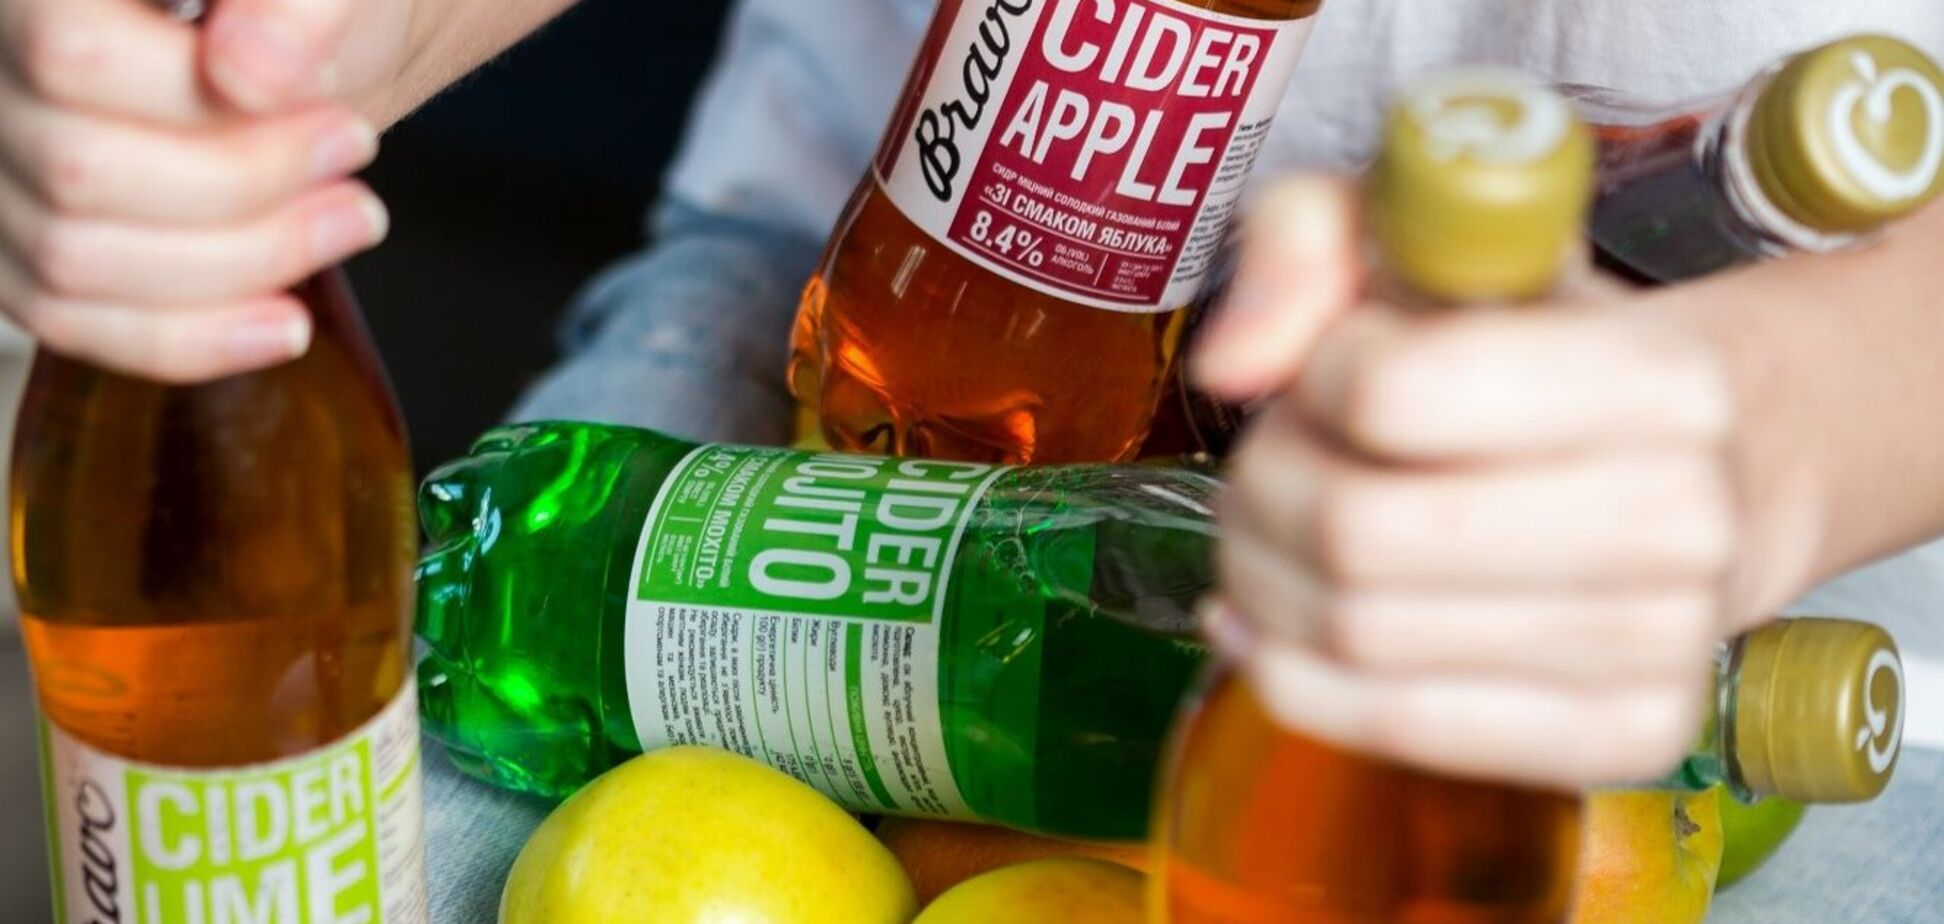 'Королевский напиток': топ-5 коктейлей на основе сидра